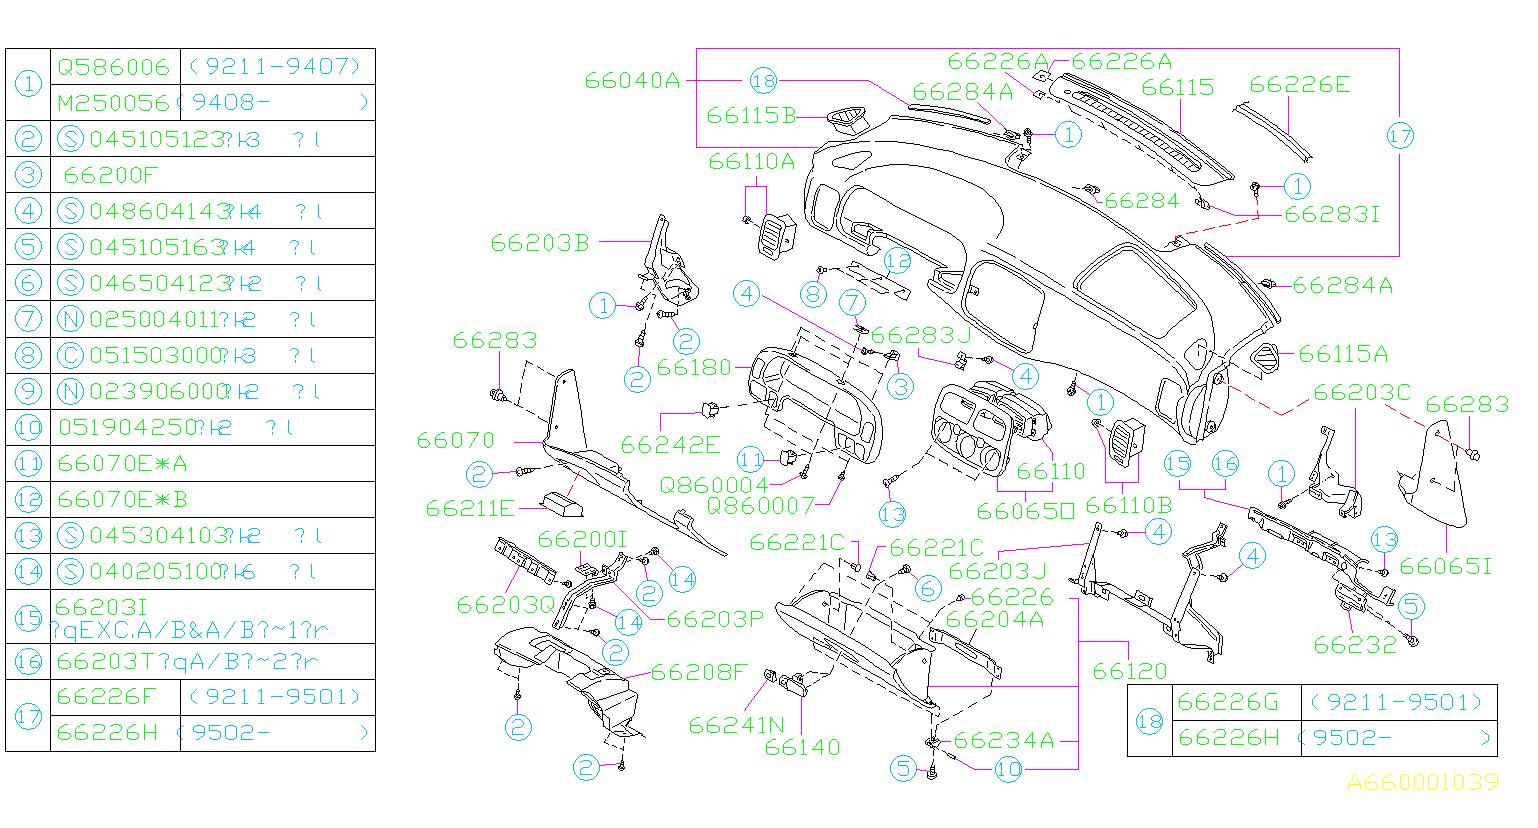 Wiring Diagram Subaru Impreza 1998 Español